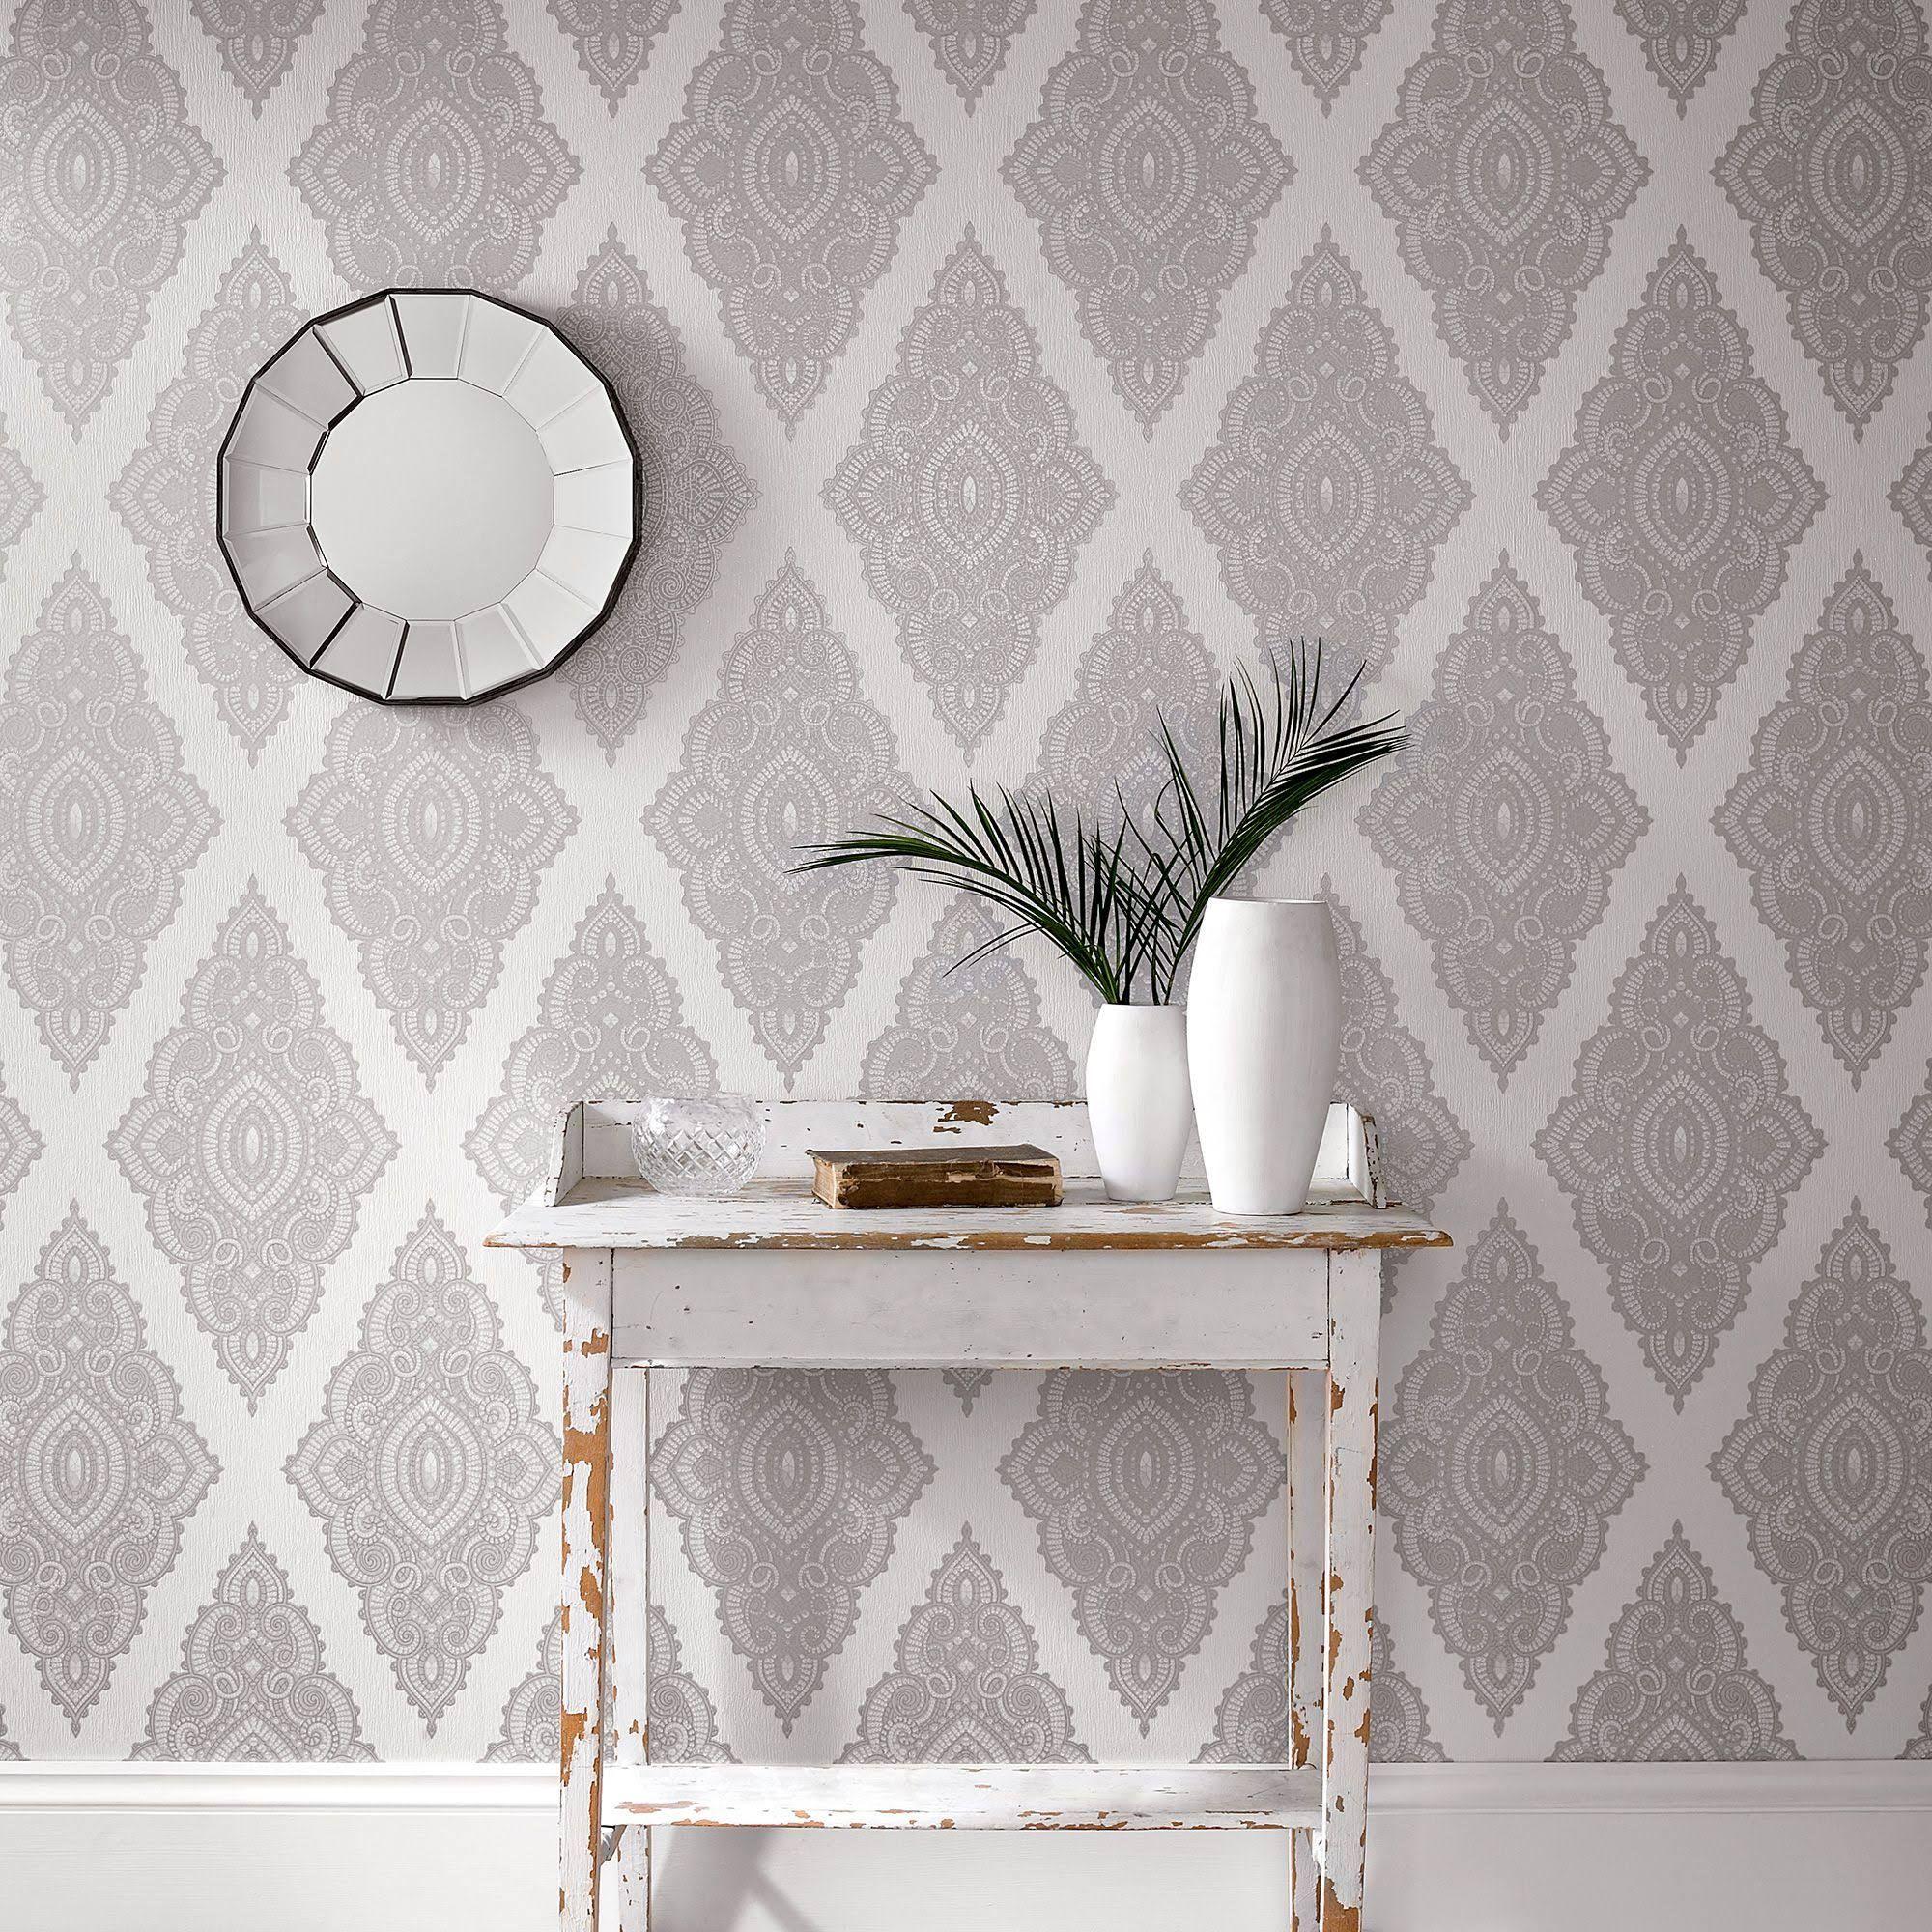 Graham Brown White Pearl Silver Jewel Wallpaper 2958387 White And Silver Wallpaper Wallpaper Design For Bedroom Silver Wallpaper